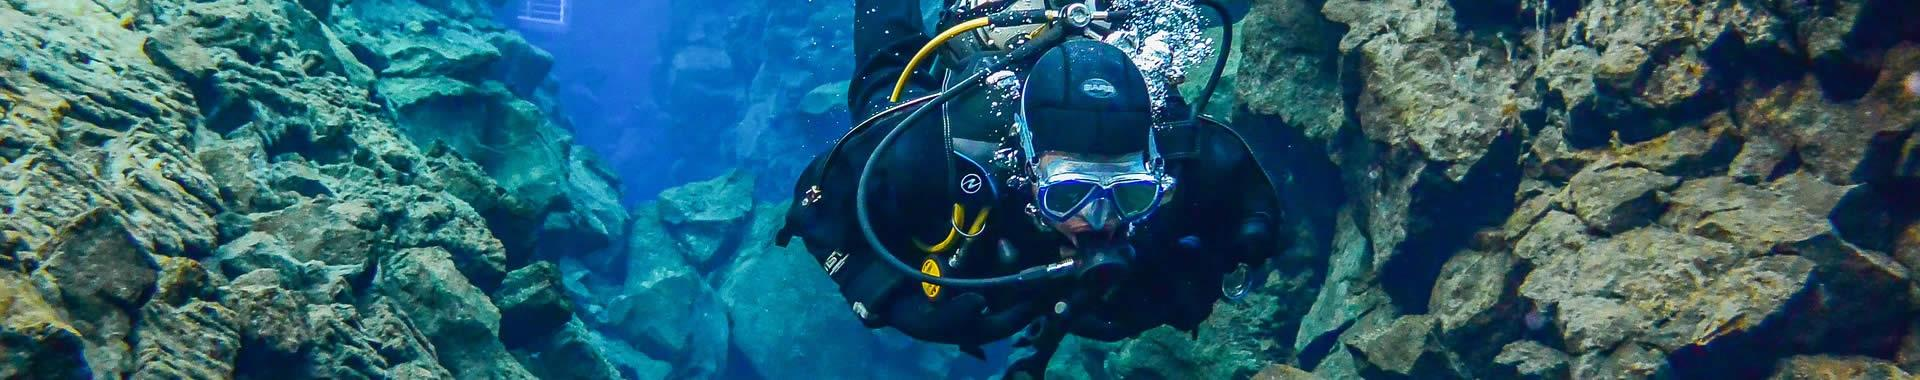 Scuba diving & snorkeling